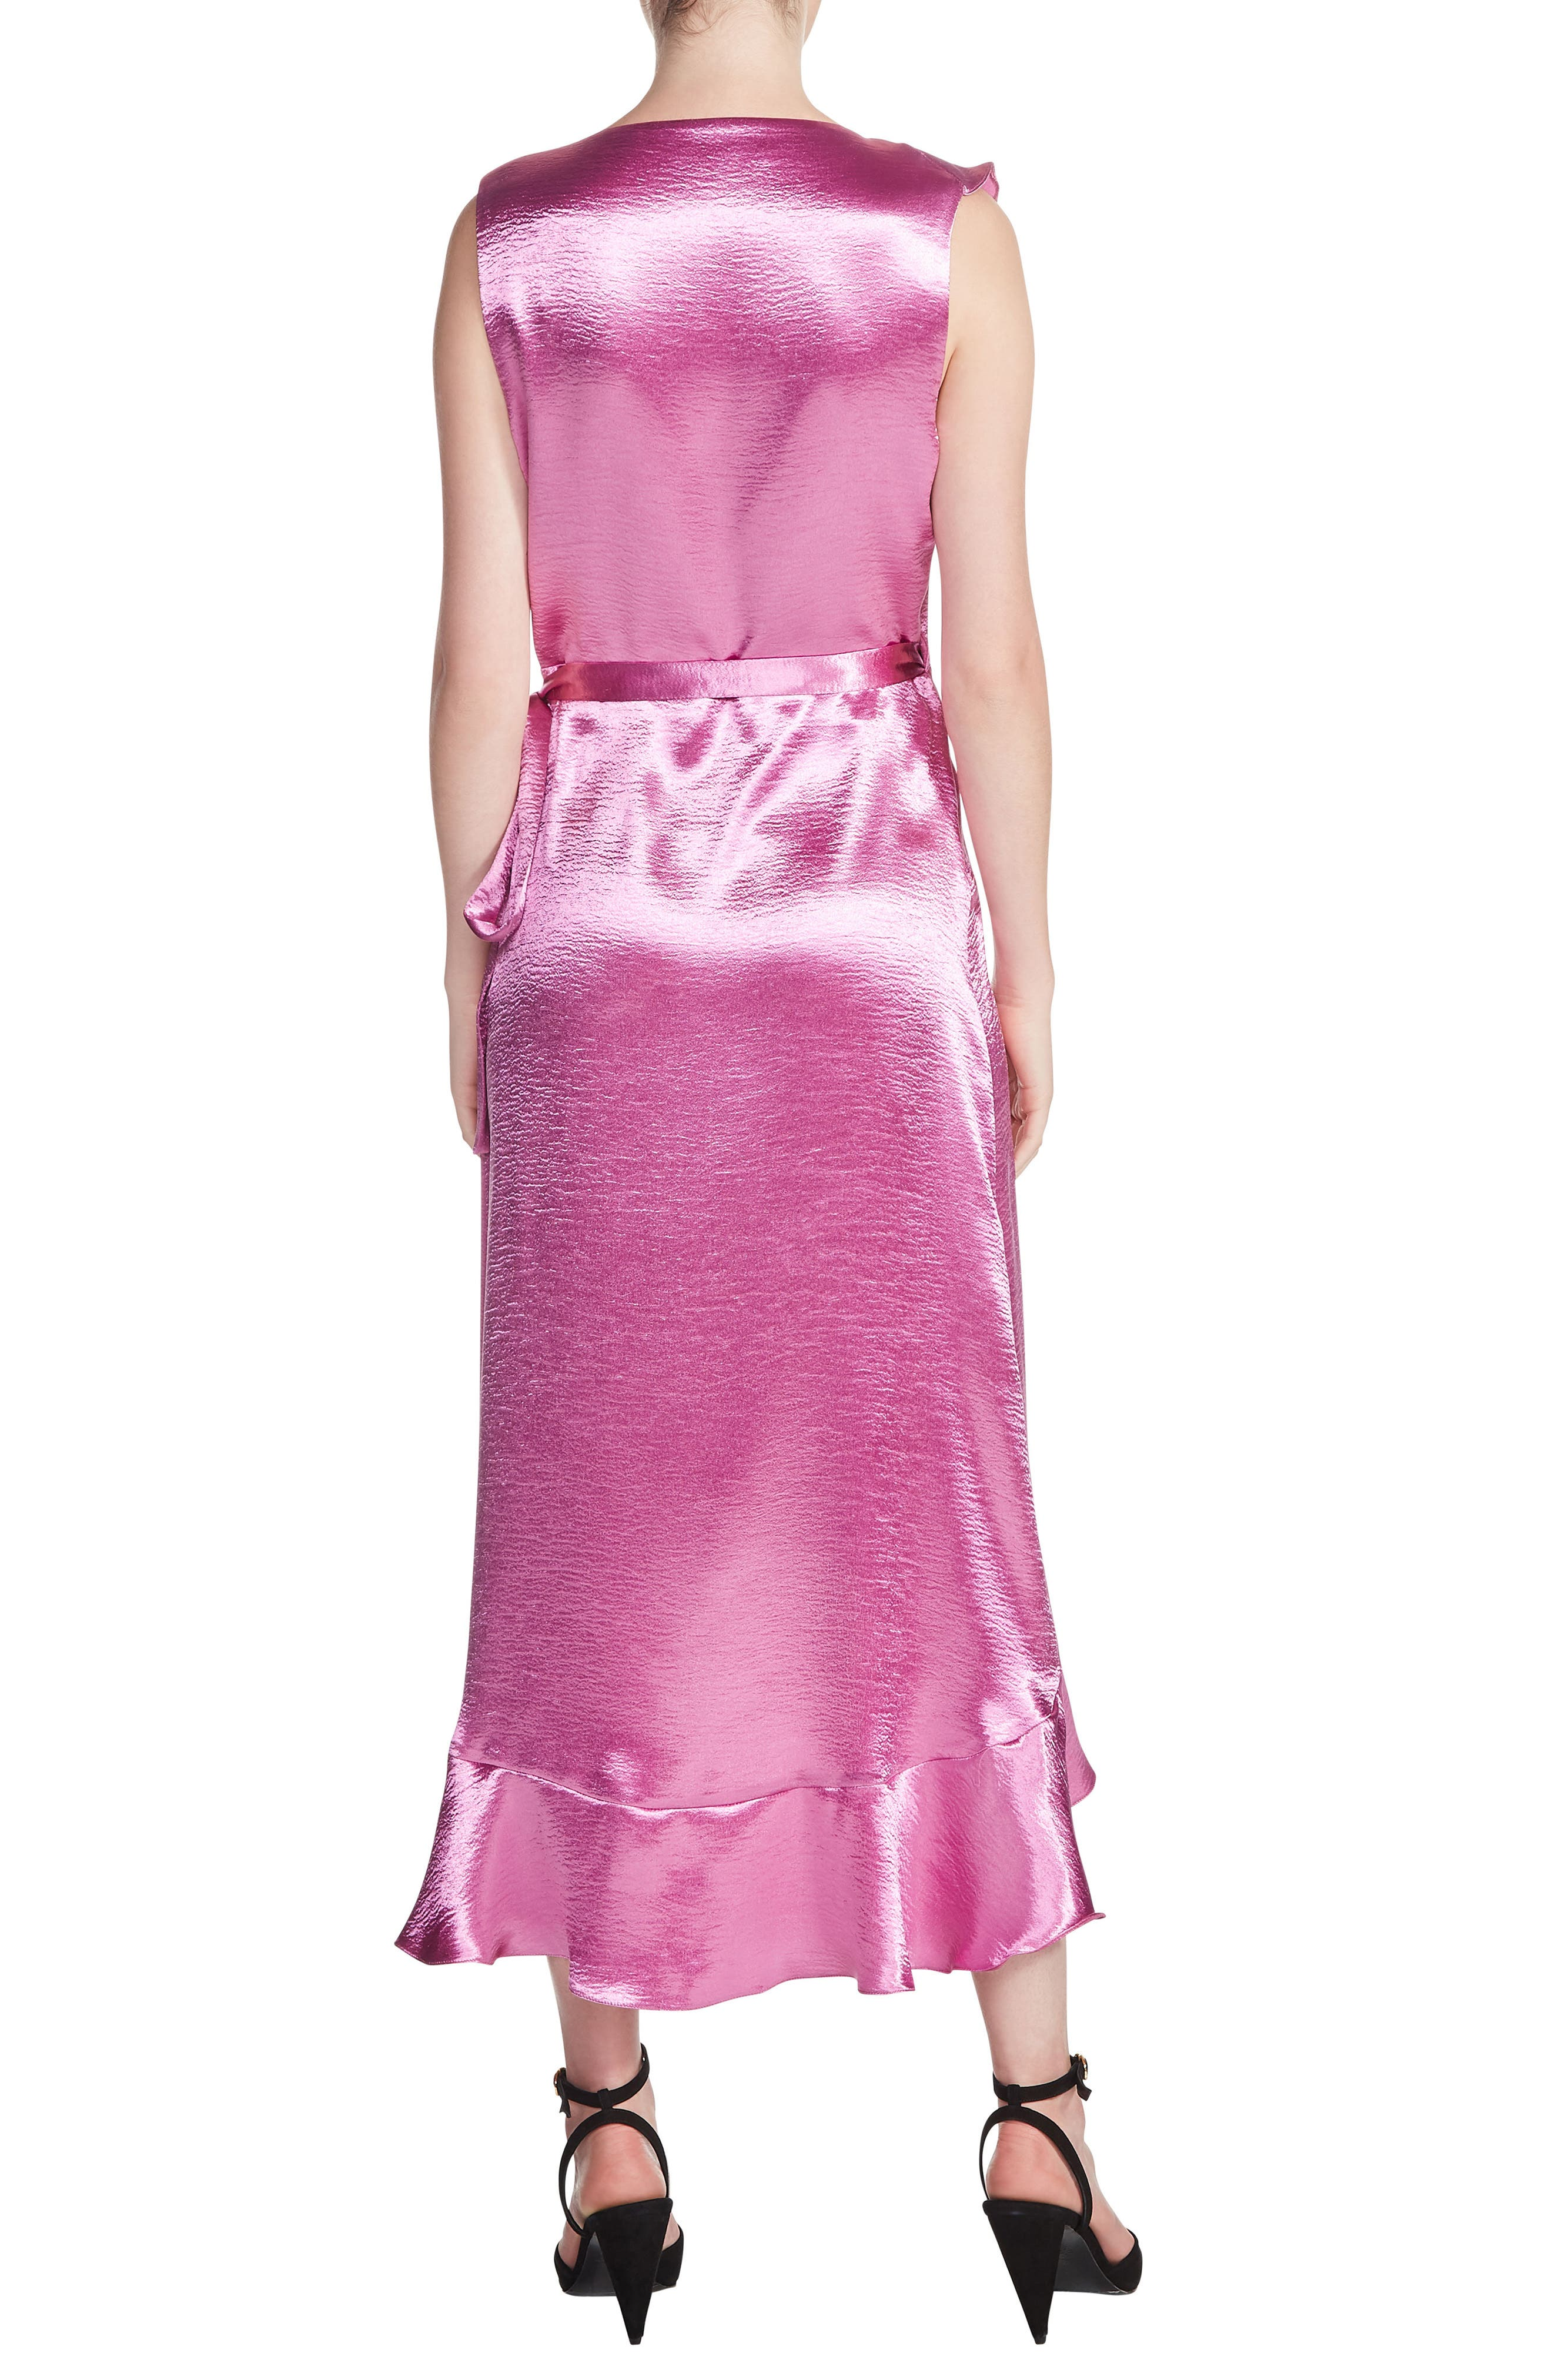 Ripple Ruffle Detail Satin Wrap Dress,                             Alternate thumbnail 2, color,                             650